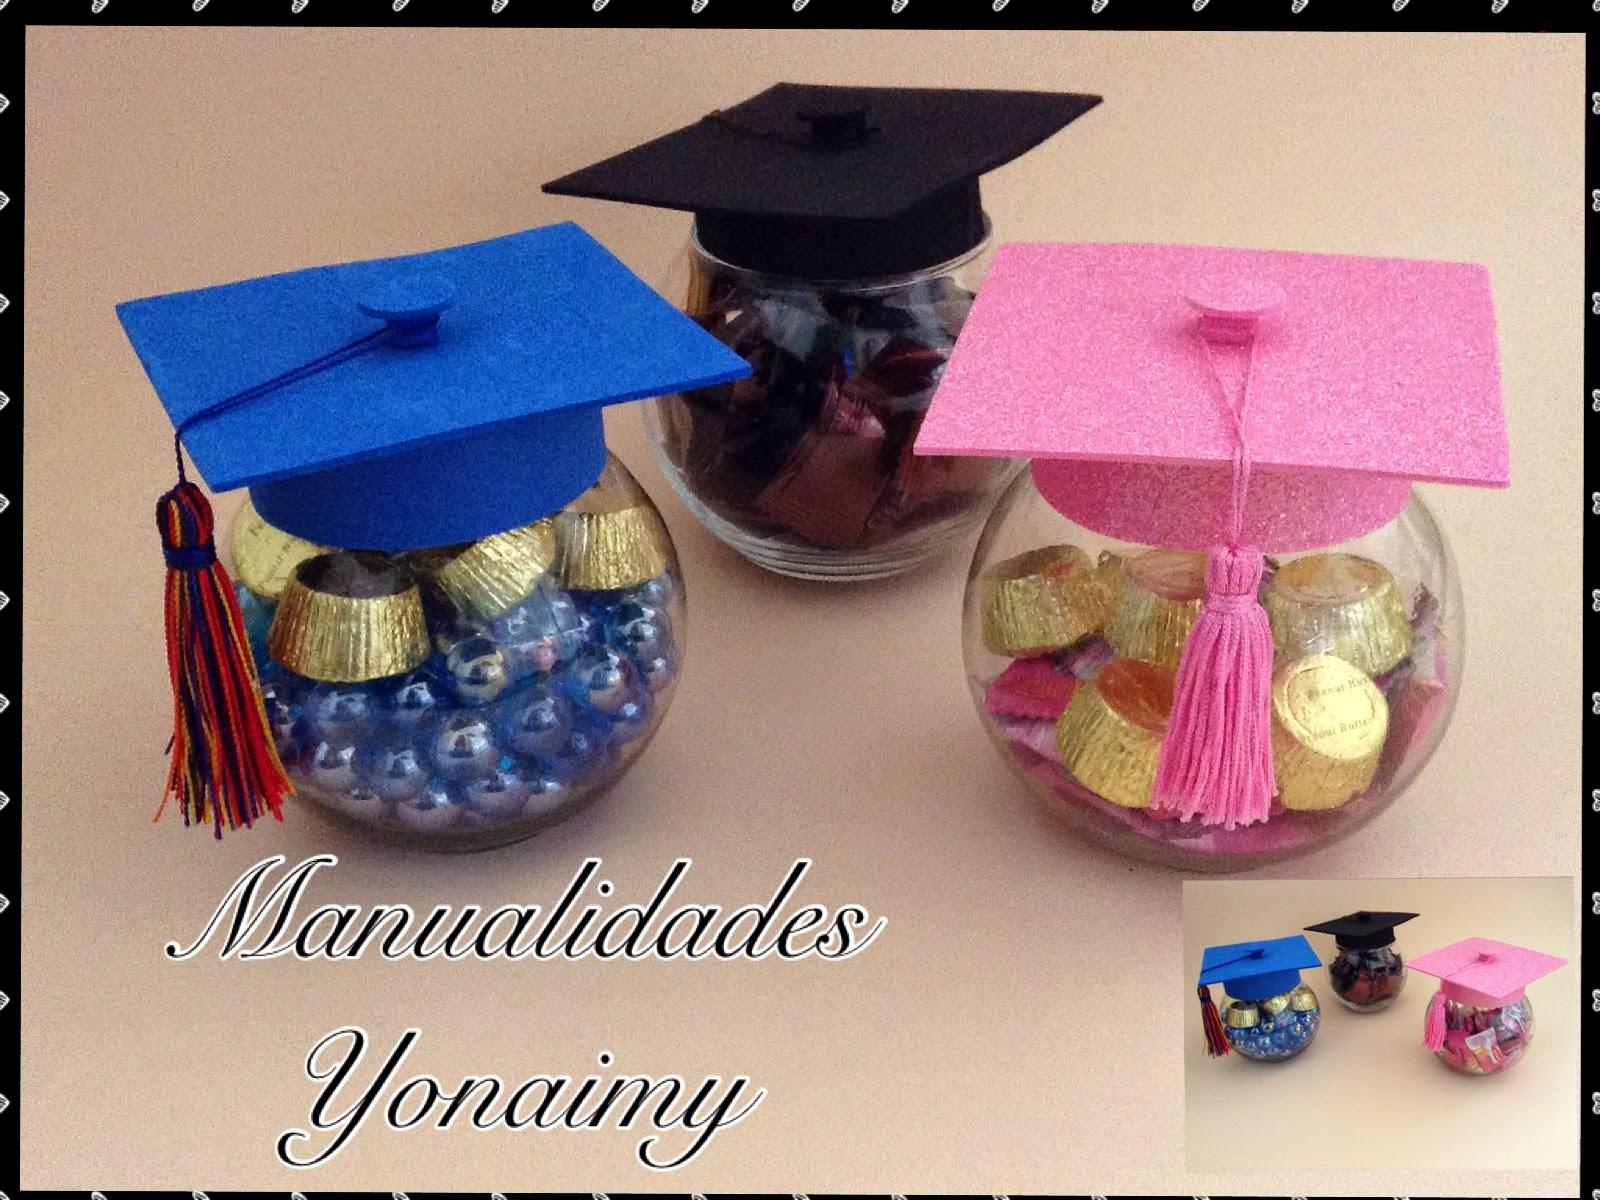 Manualidades yonaimy for Manualidades primaria